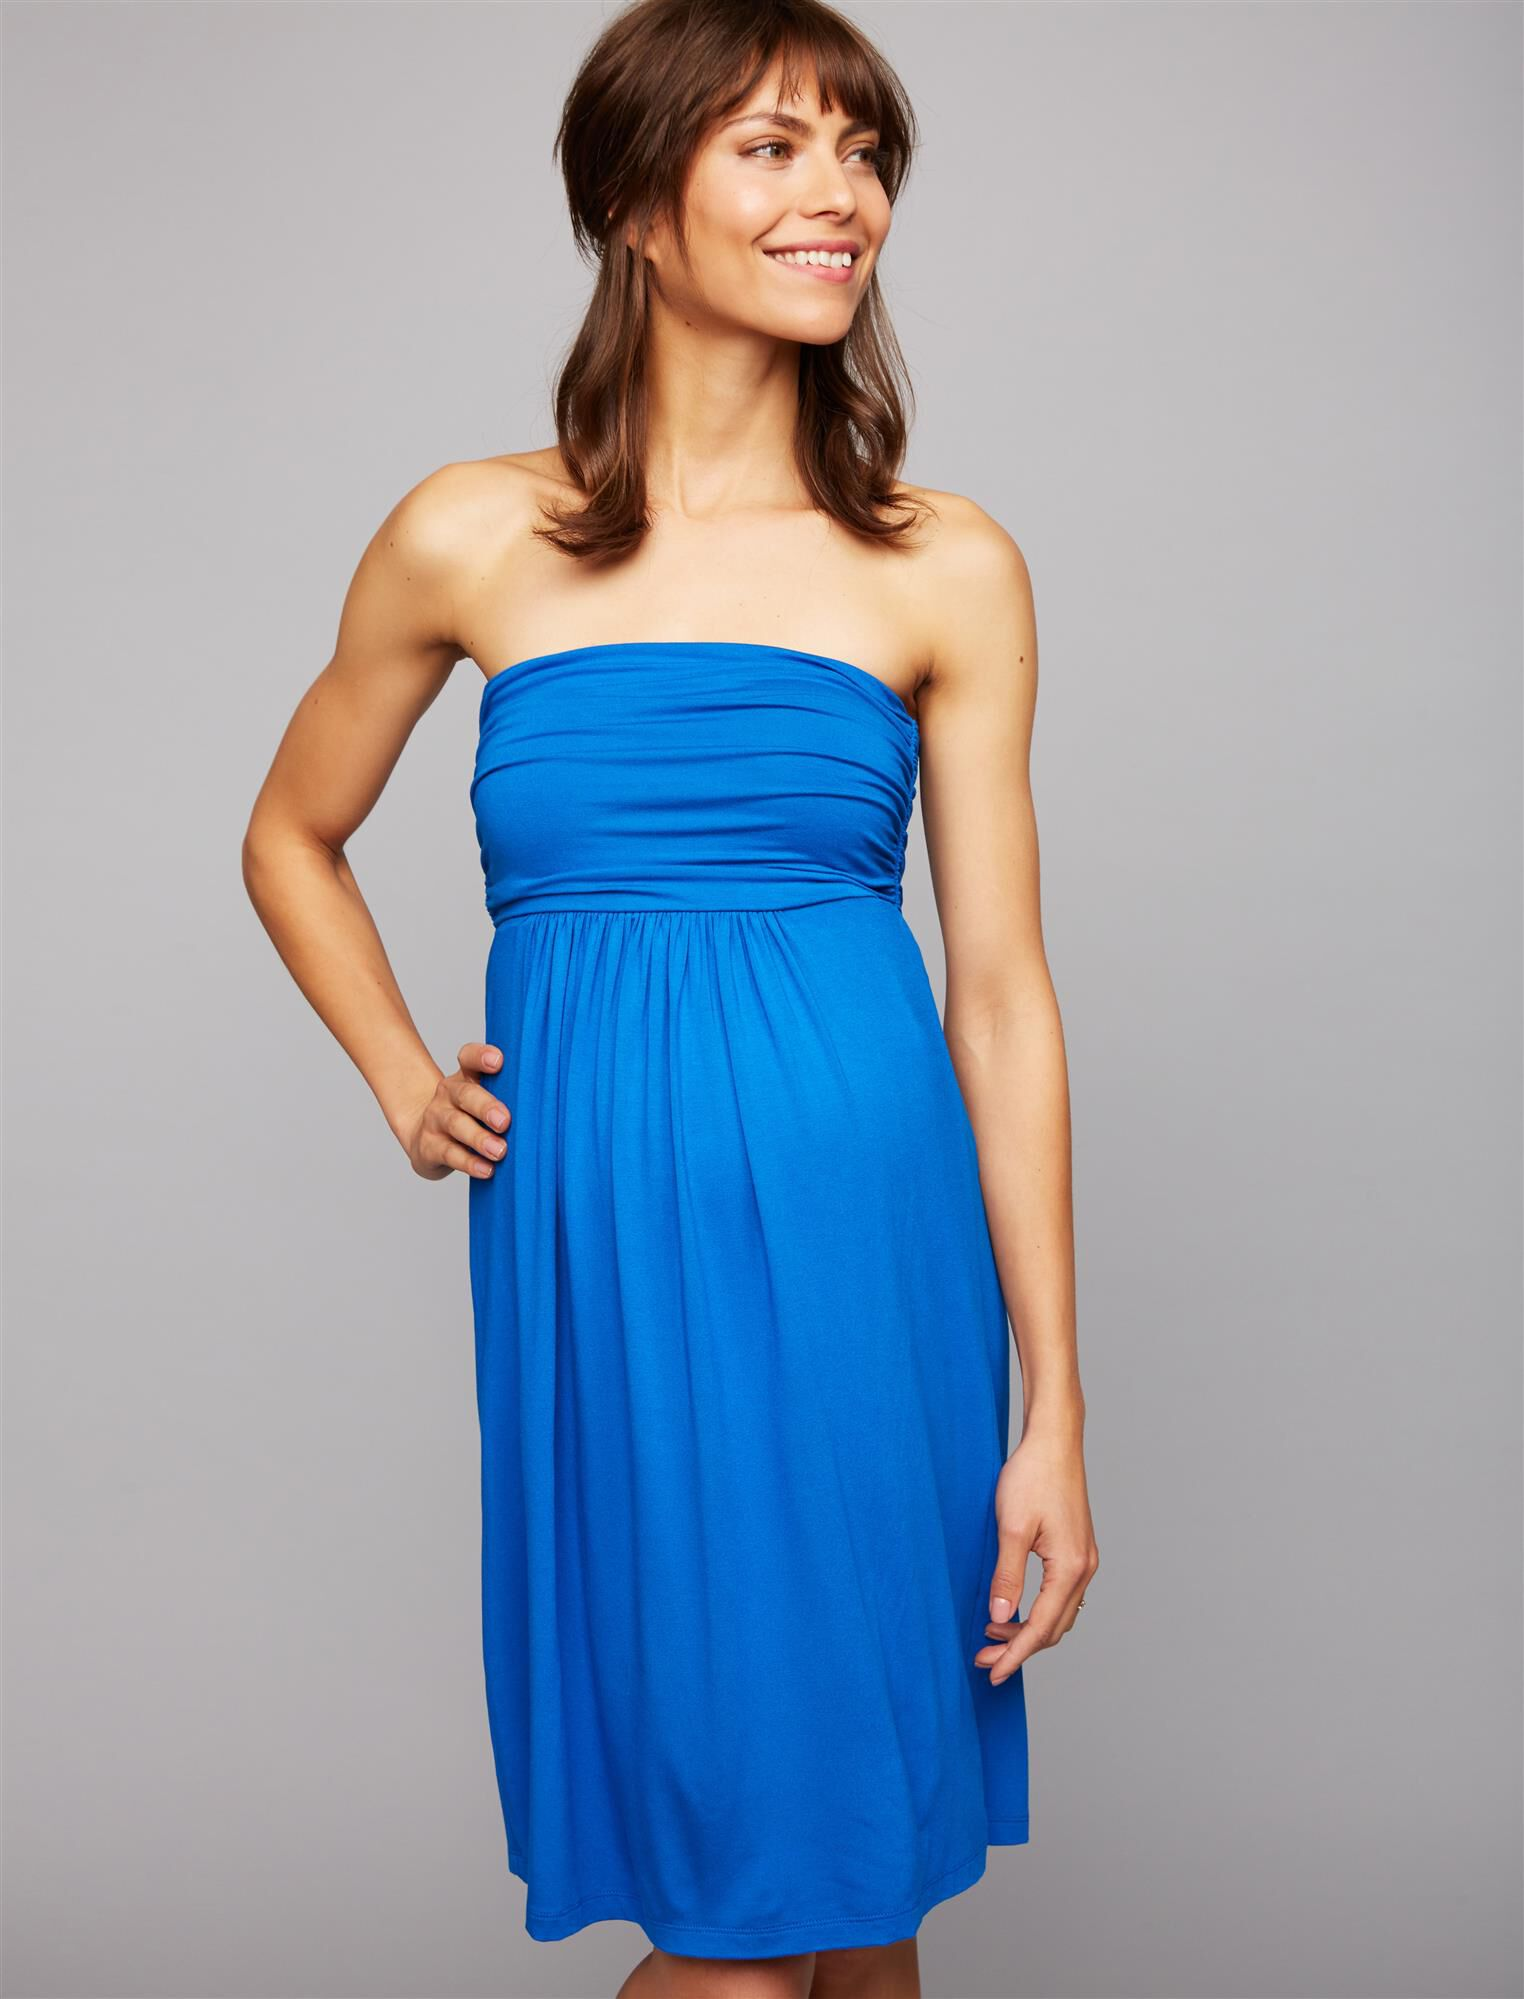 Isabella Oliver Delphine Strapless Maternity Dress